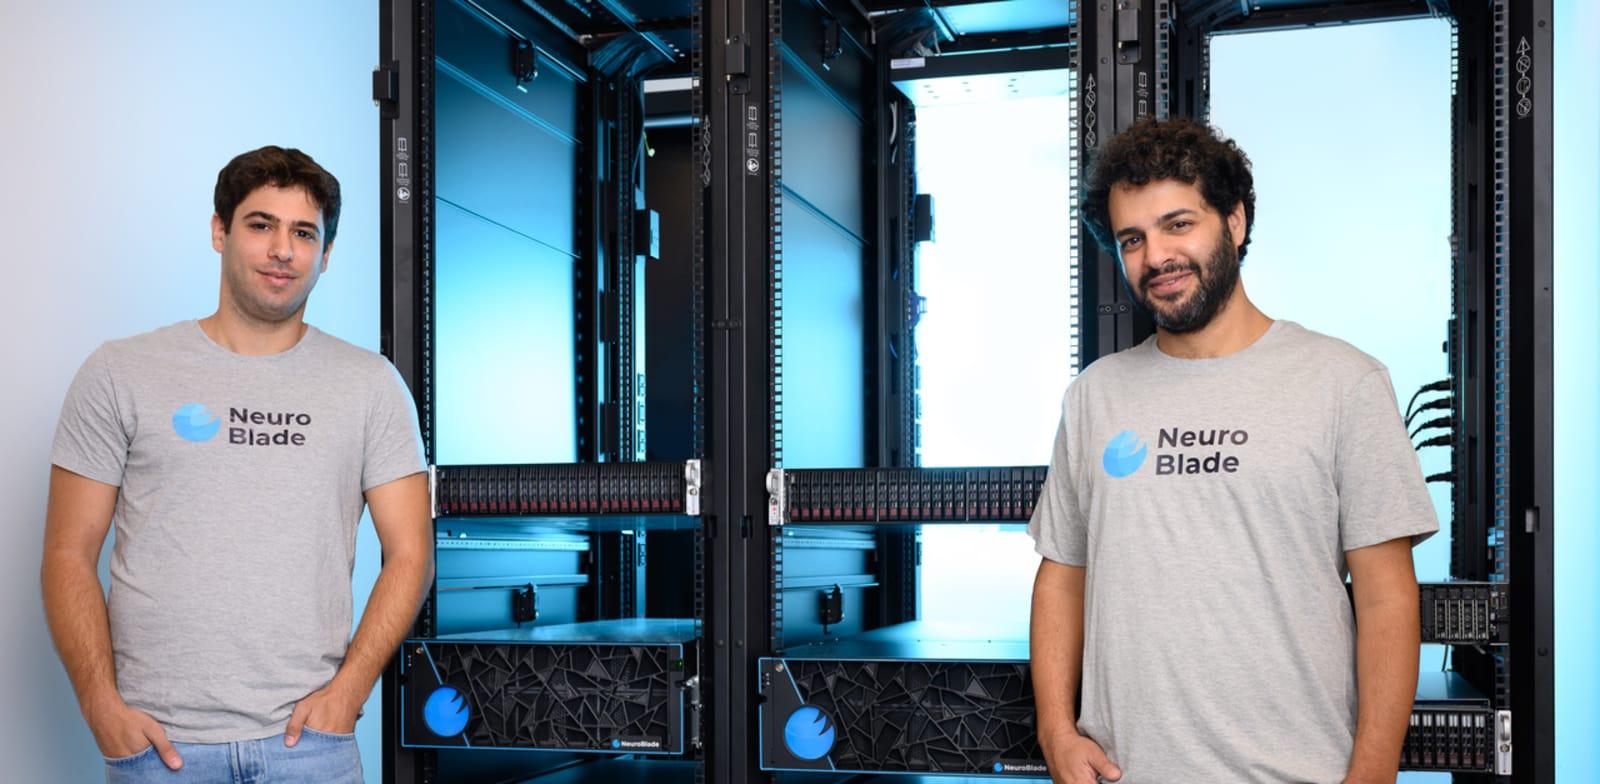 NeuroBlade founders Photo: David Garb